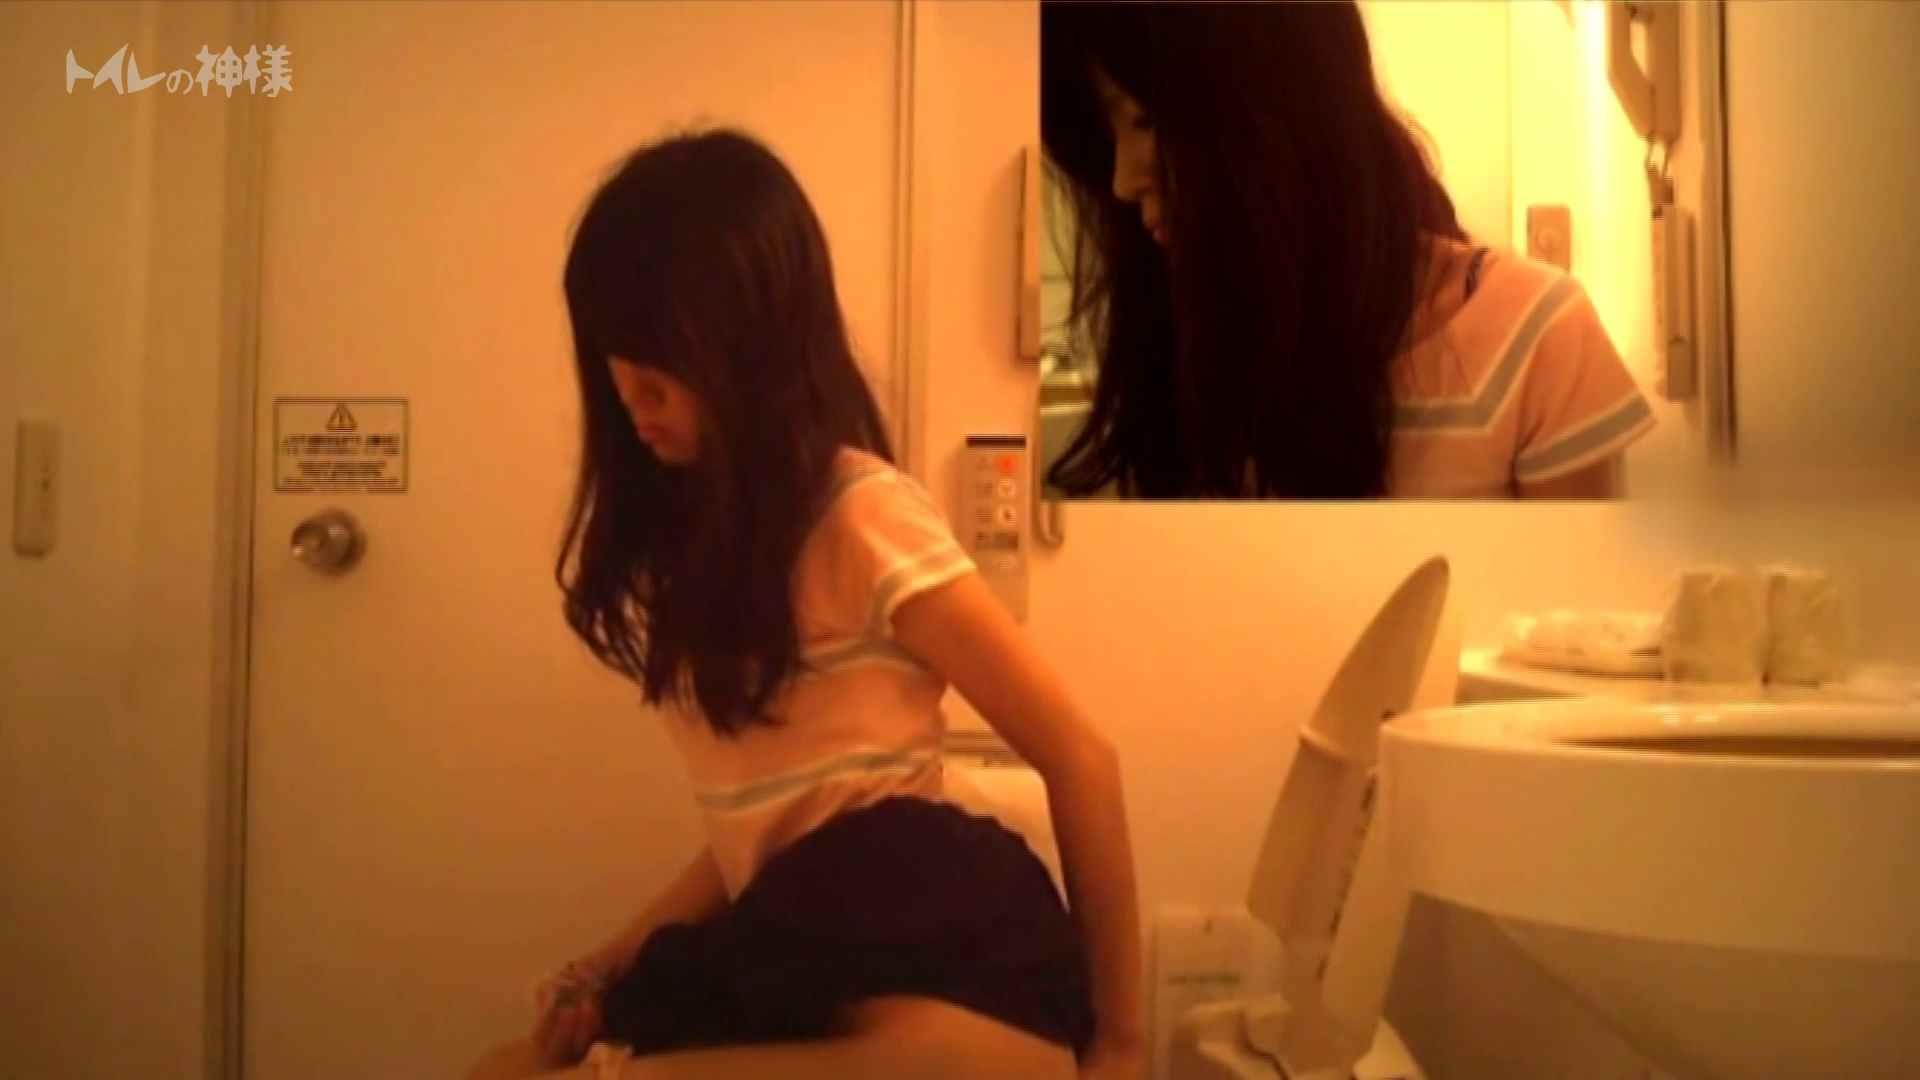 Vol.04 女子大生のトイレ恥態 OLハメ撮り  104Pix 52